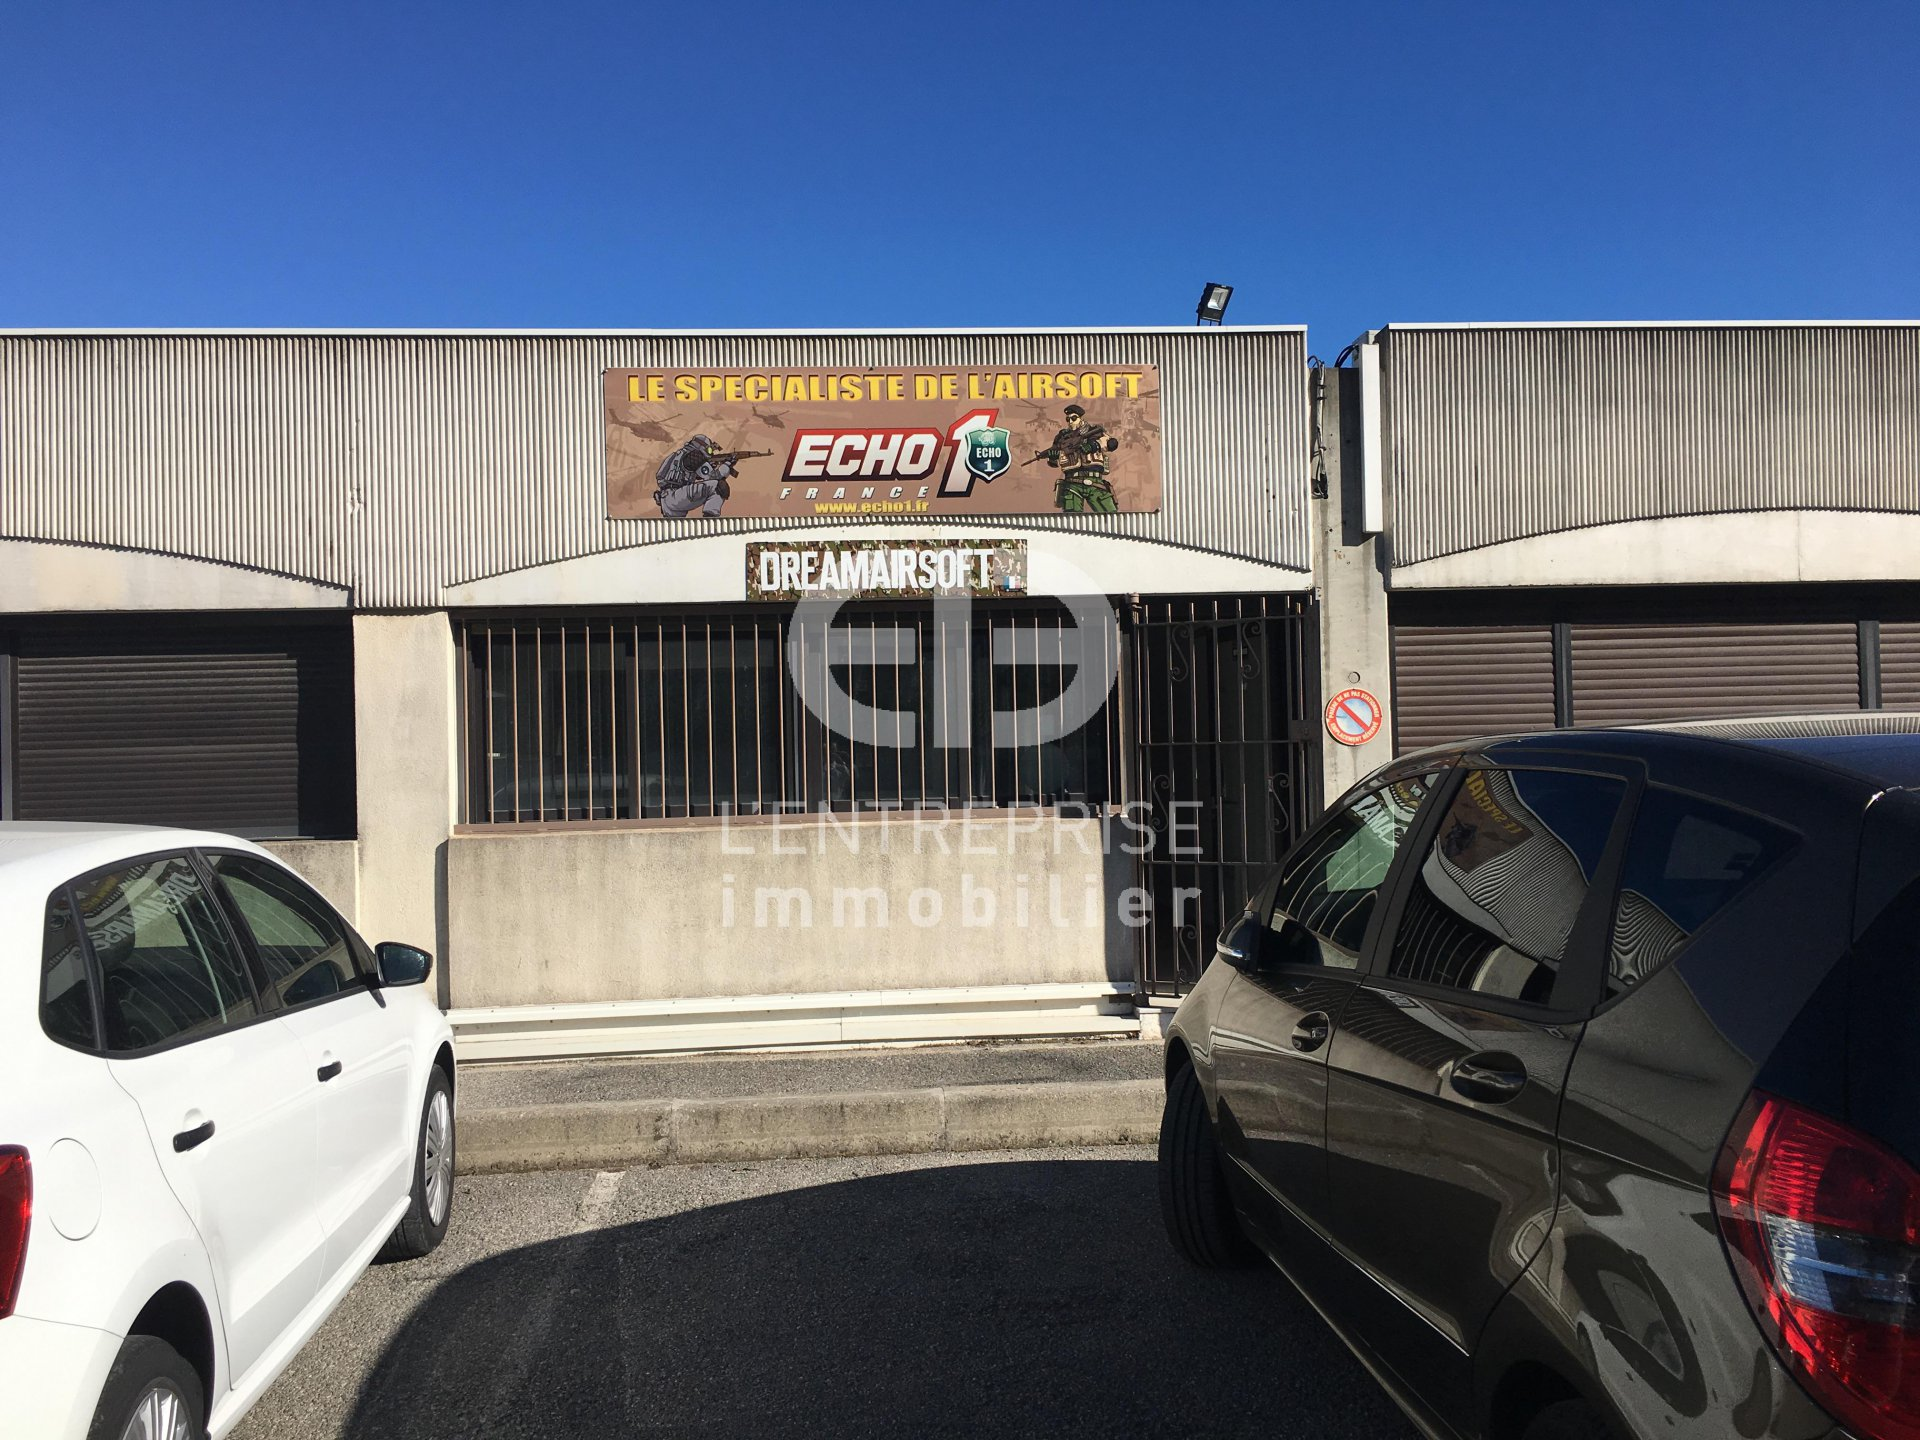 A vendre local entrep ts saint bernard vallauris for Taxe fonciere garage prix